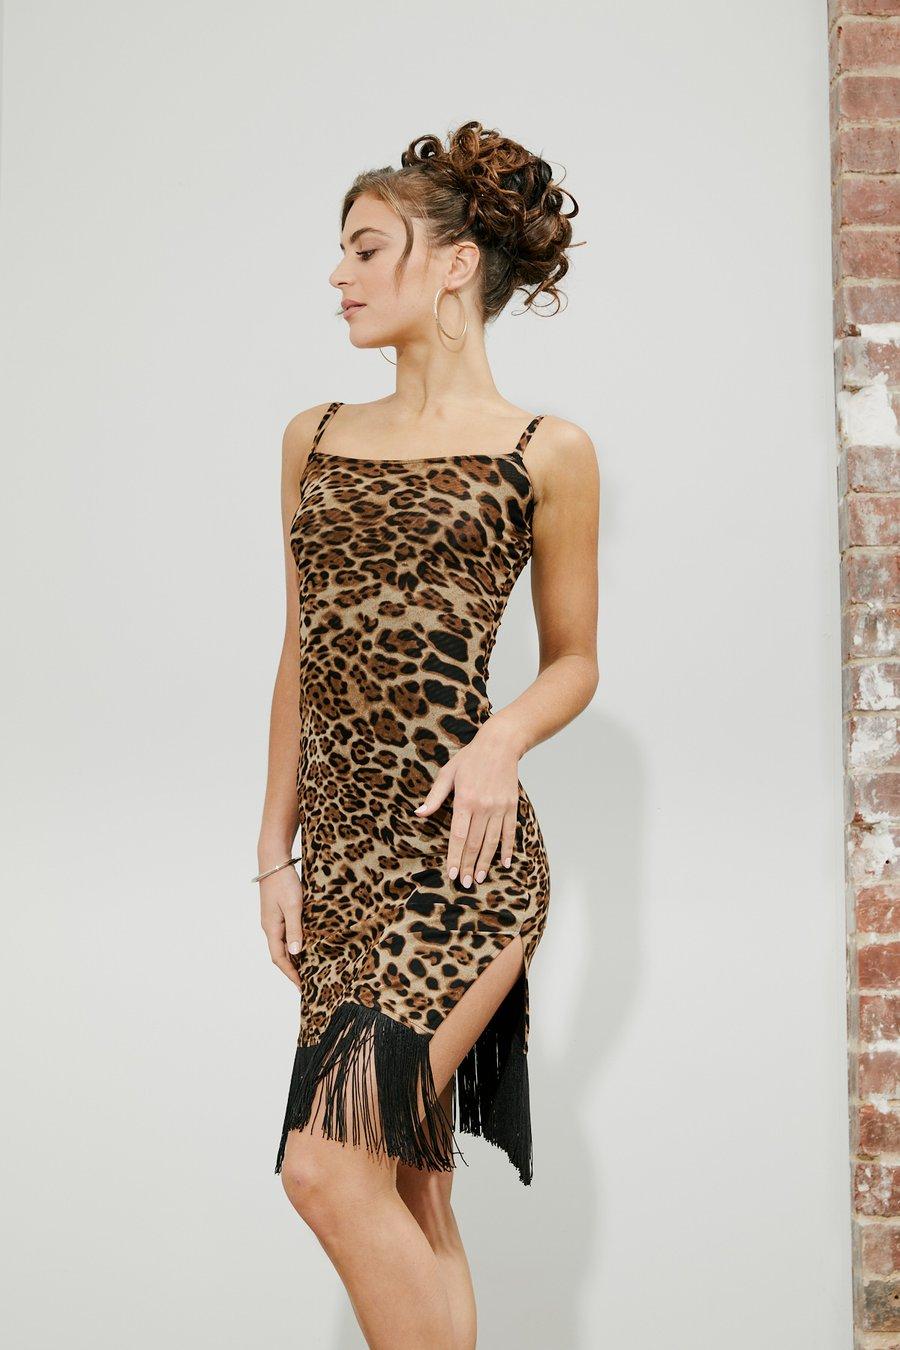 Image of Mini Split Fringe Dress H10116 Animal Dancewear latin ballroom